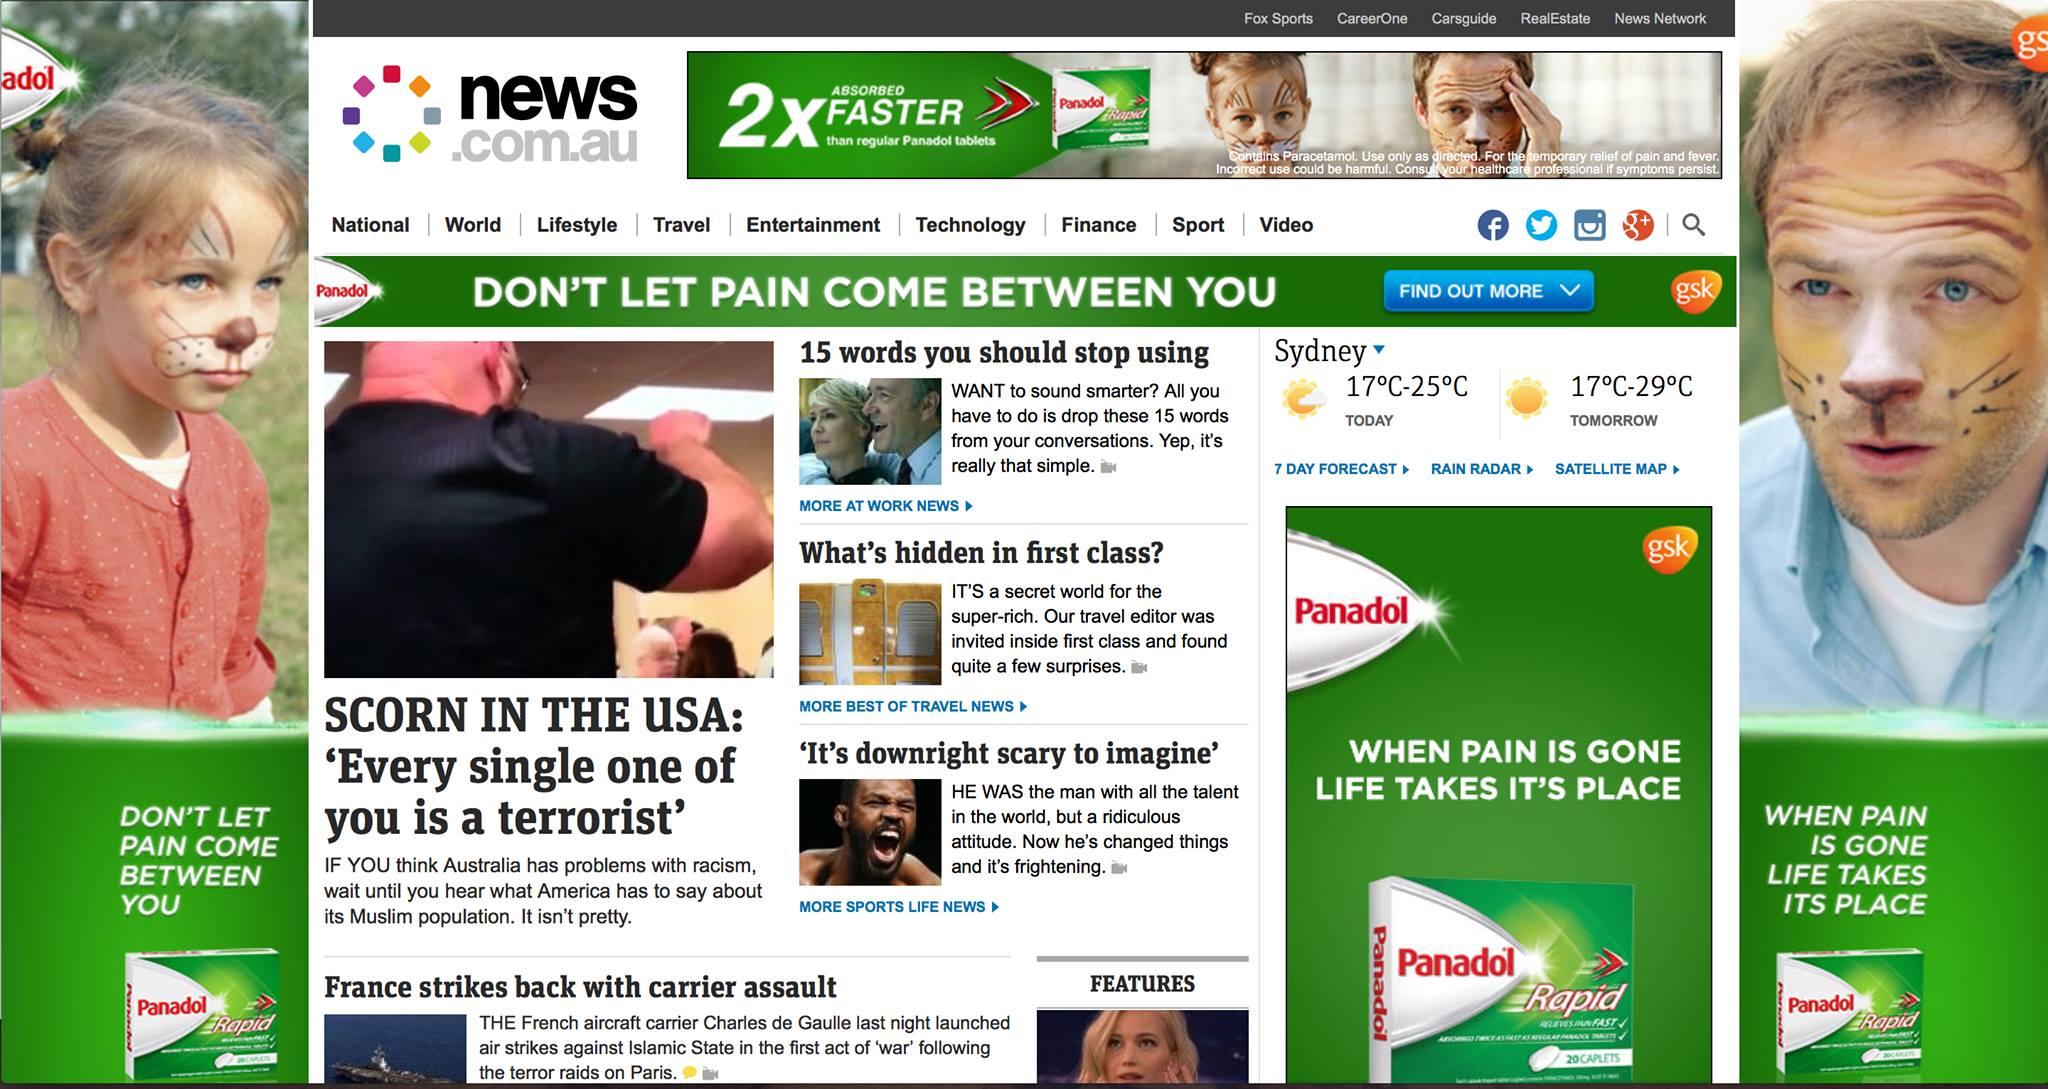 news ads